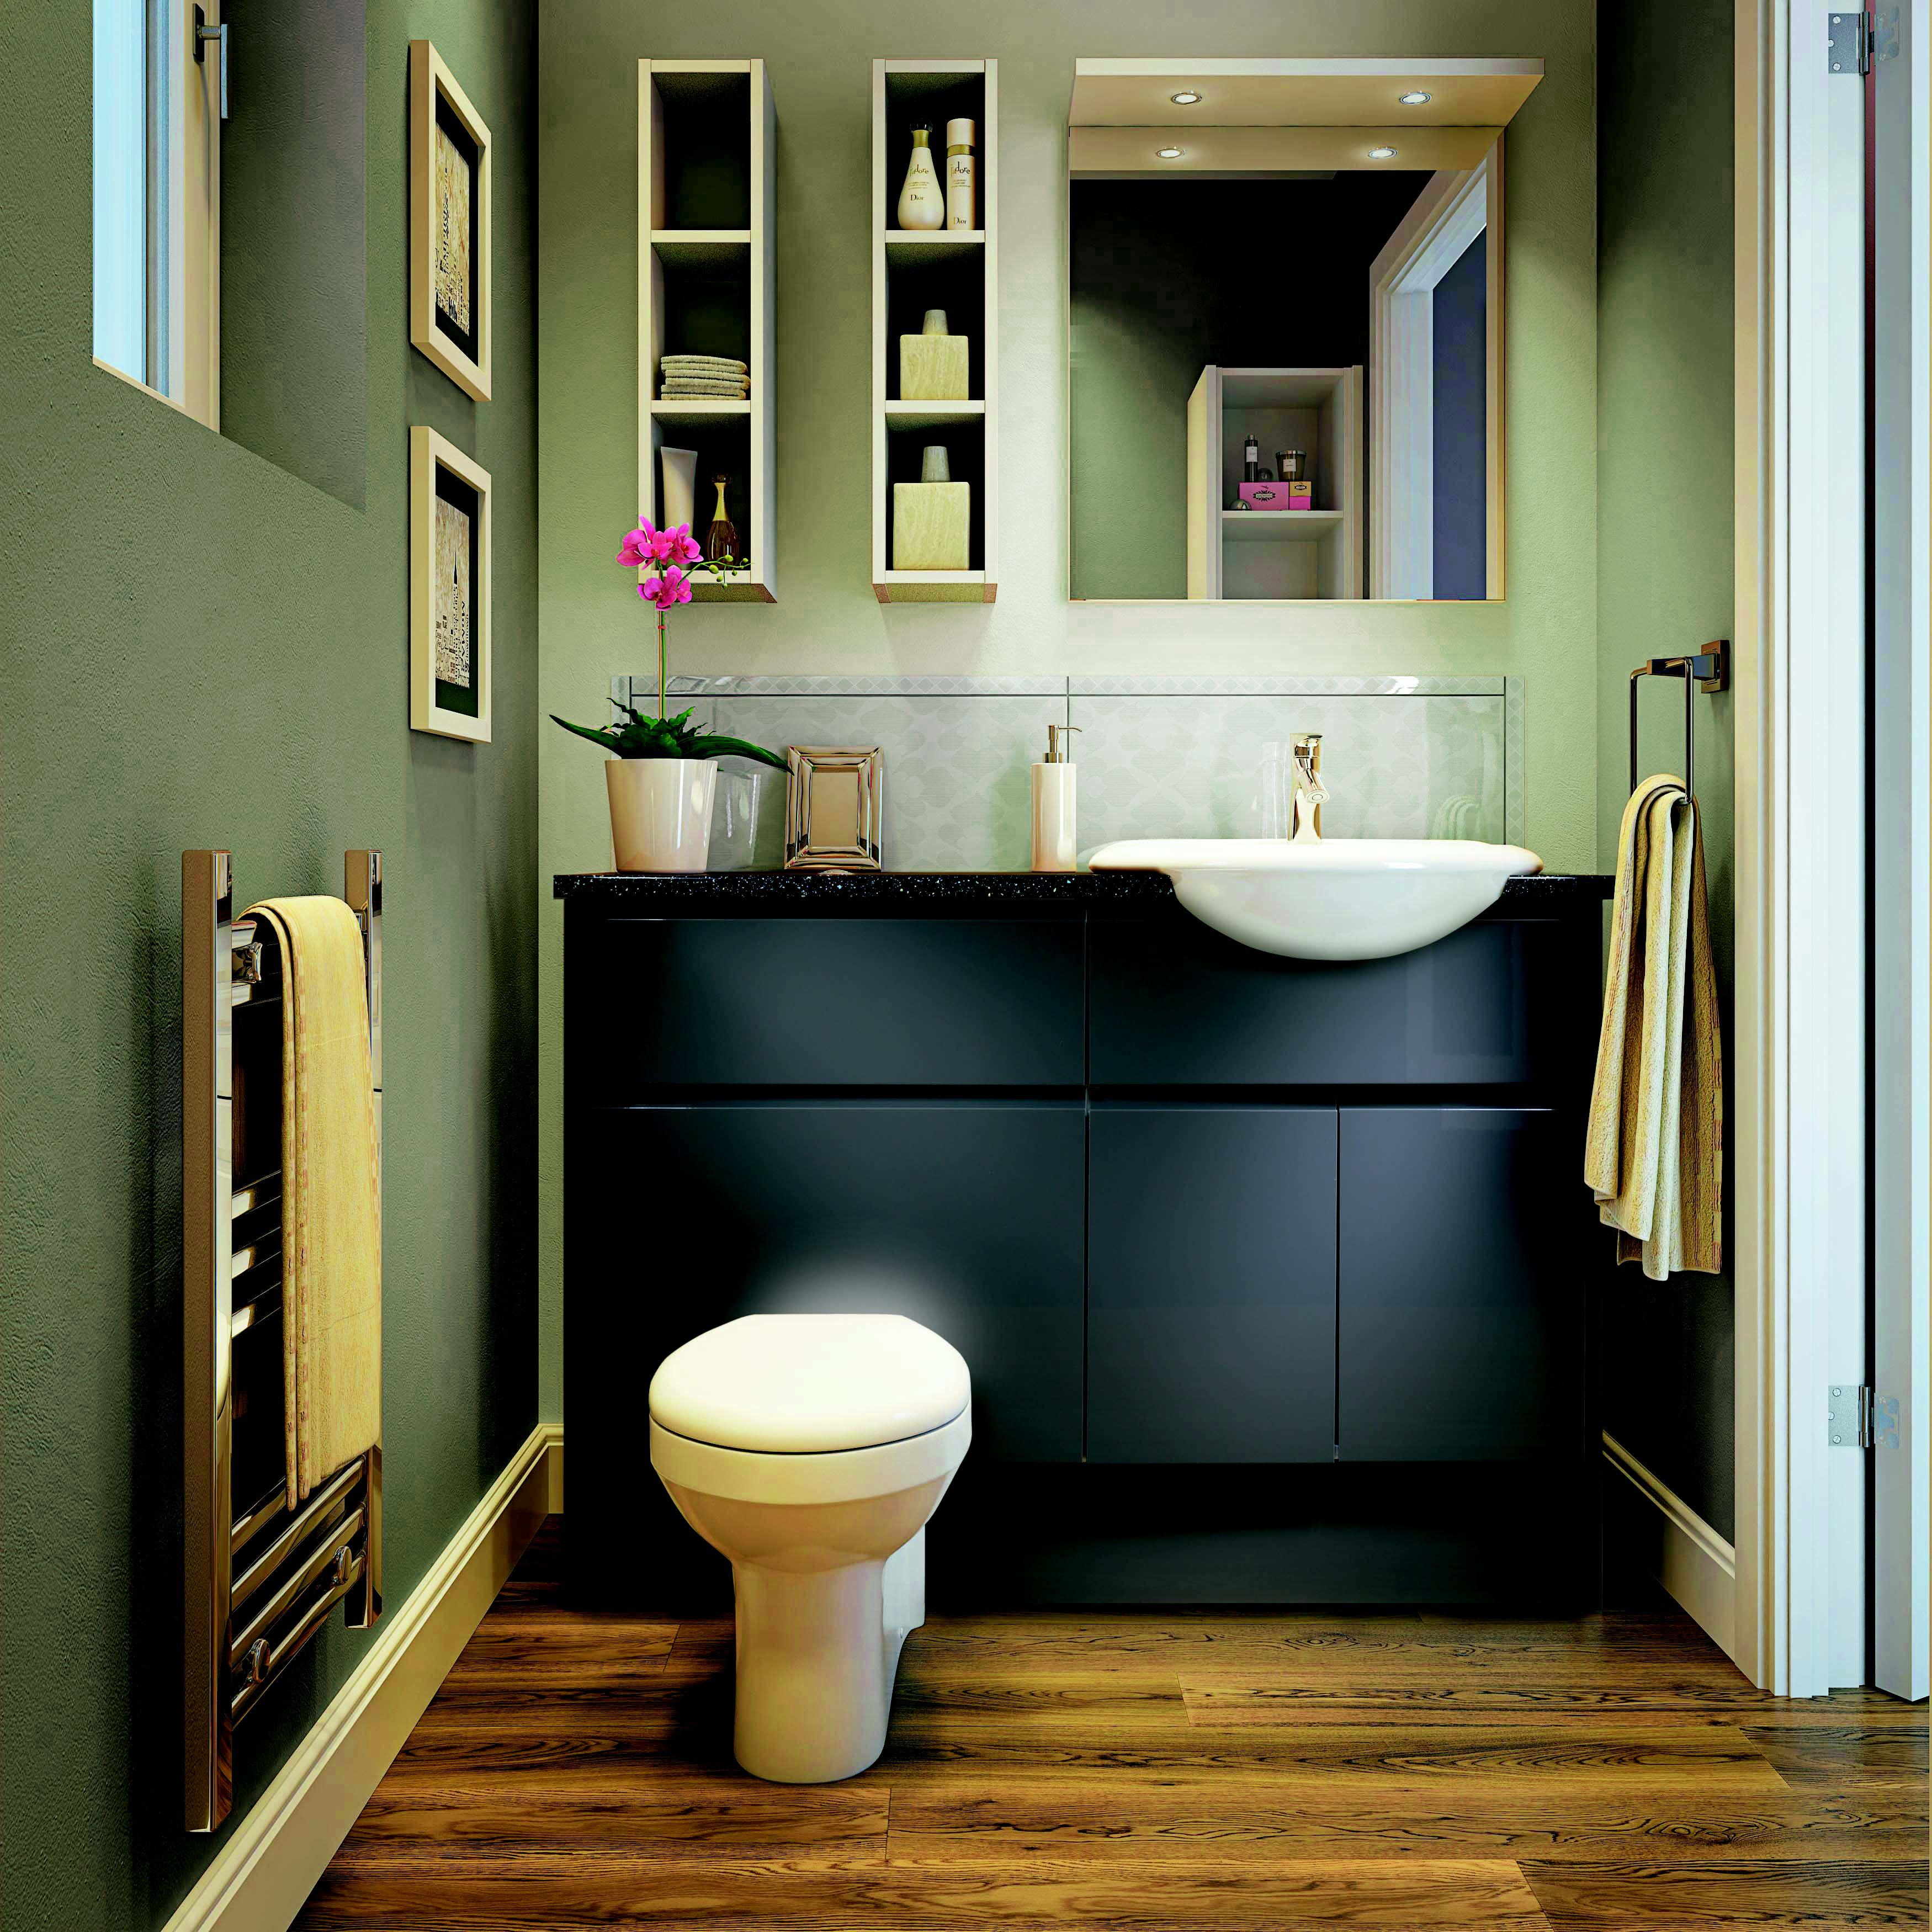 Marletti Fitted Bathroom Furniture